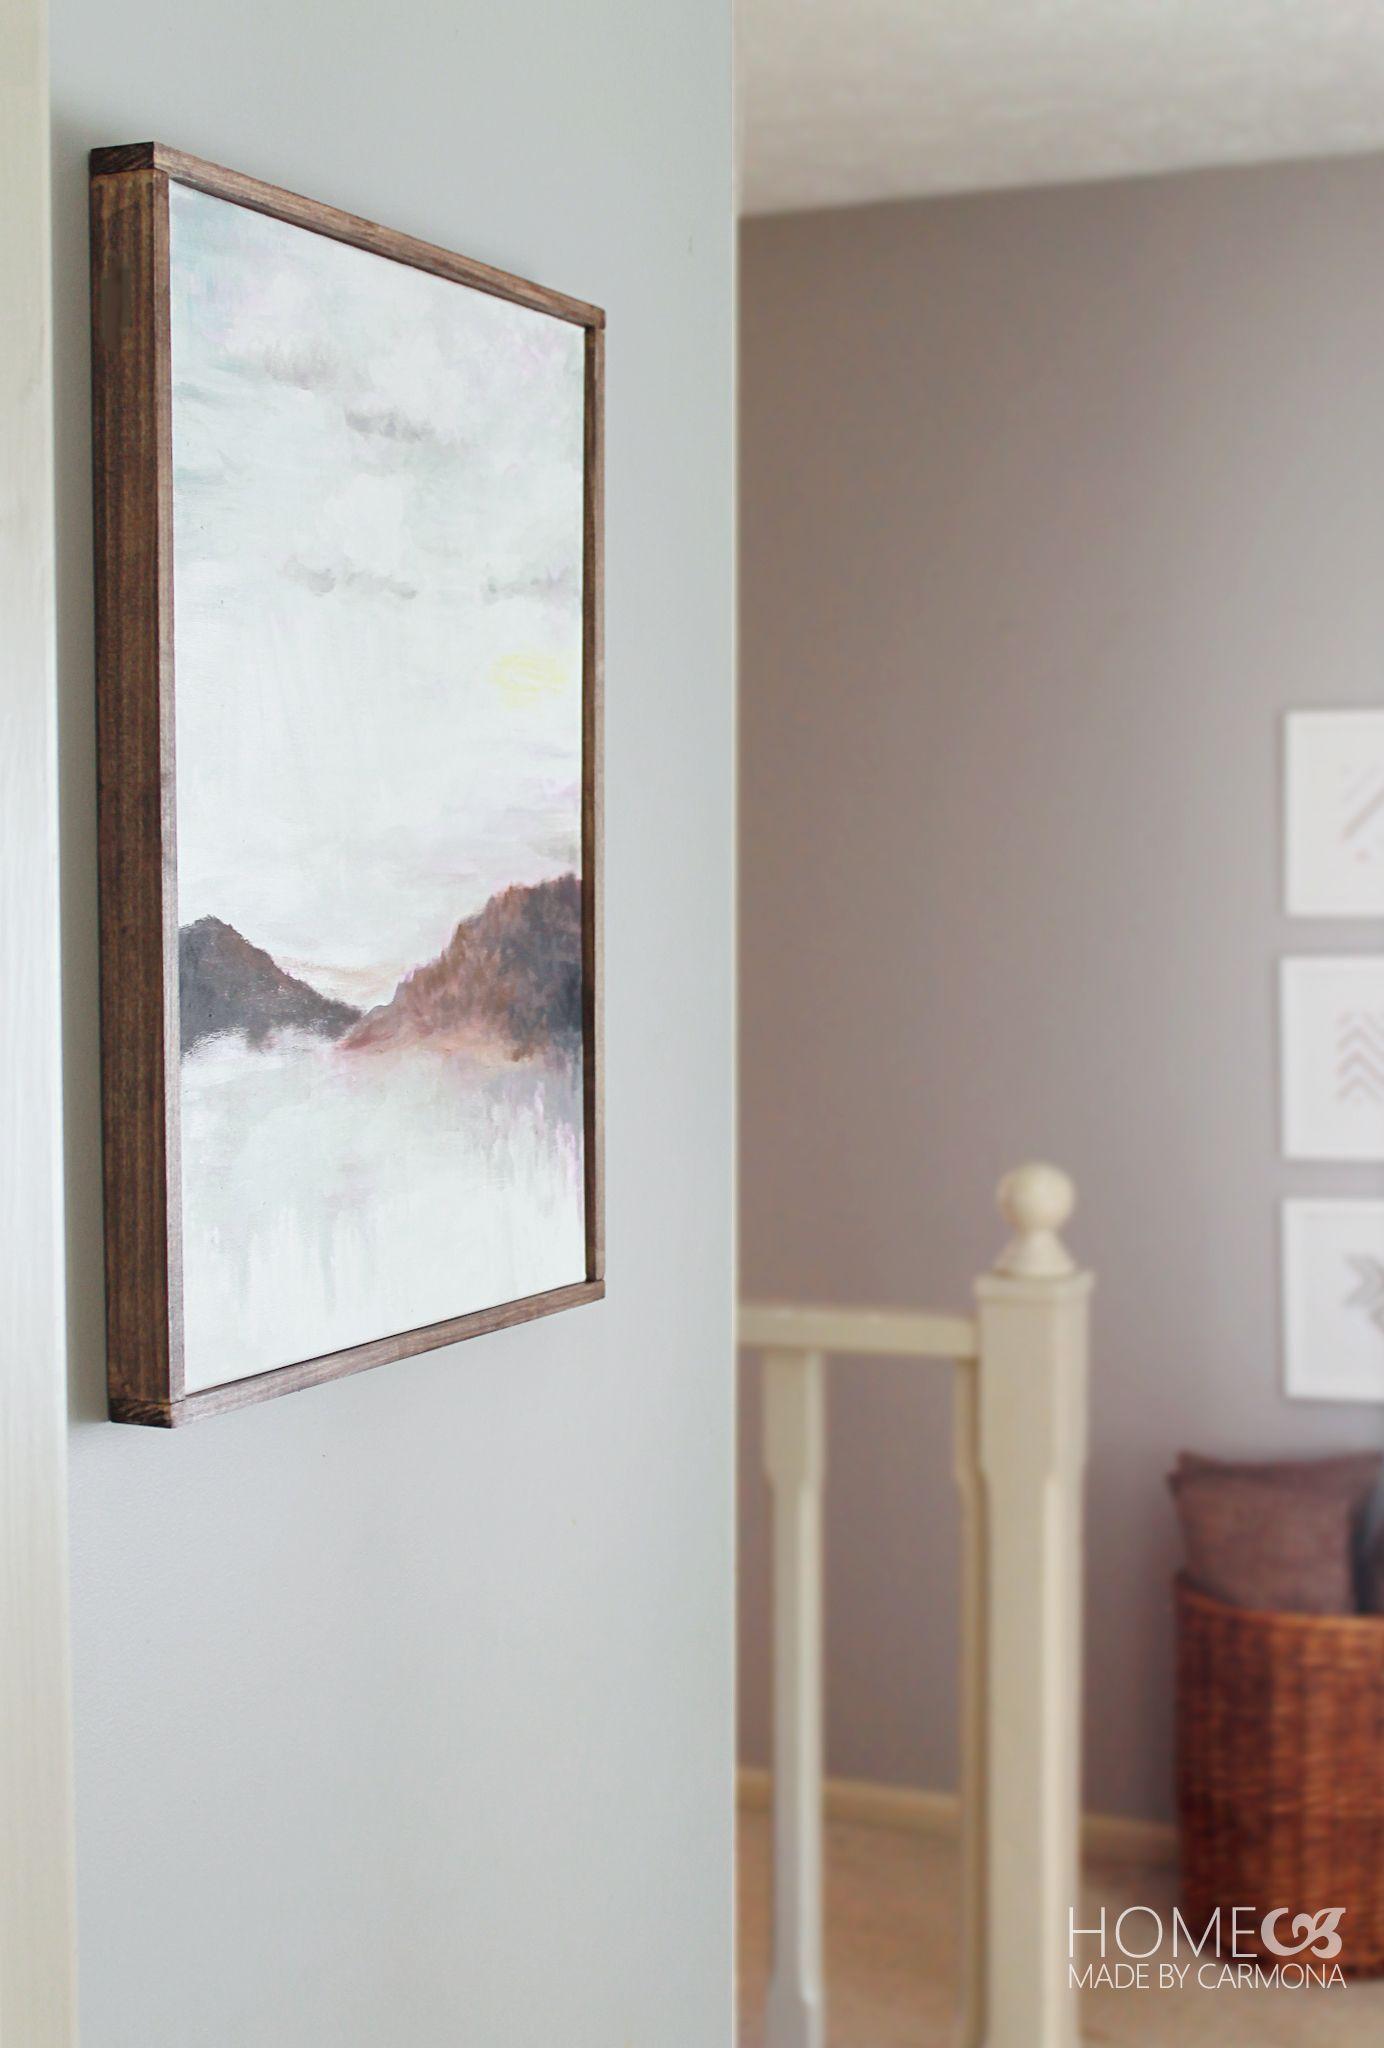 DIY Floating Frame Tutorial For $6! | DIYs | Pinterest | Floating ...